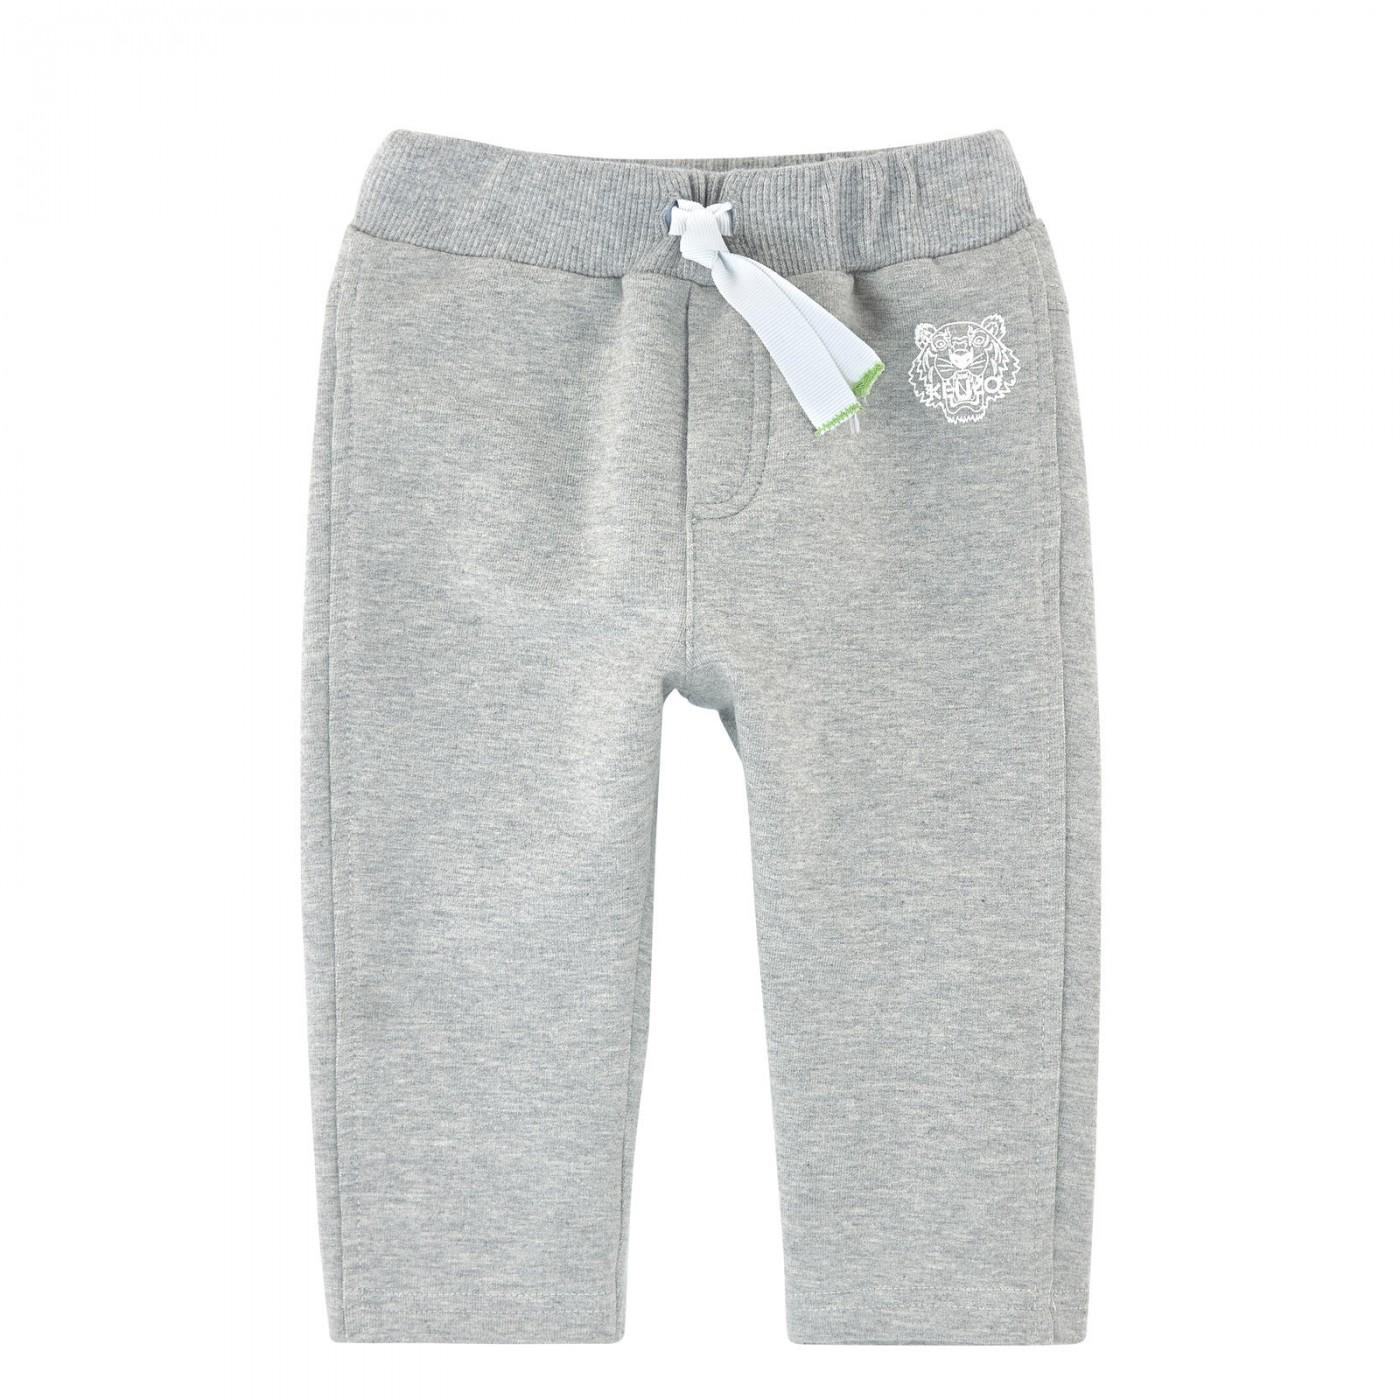 Спортивные брюки Kenzo KH23012-24